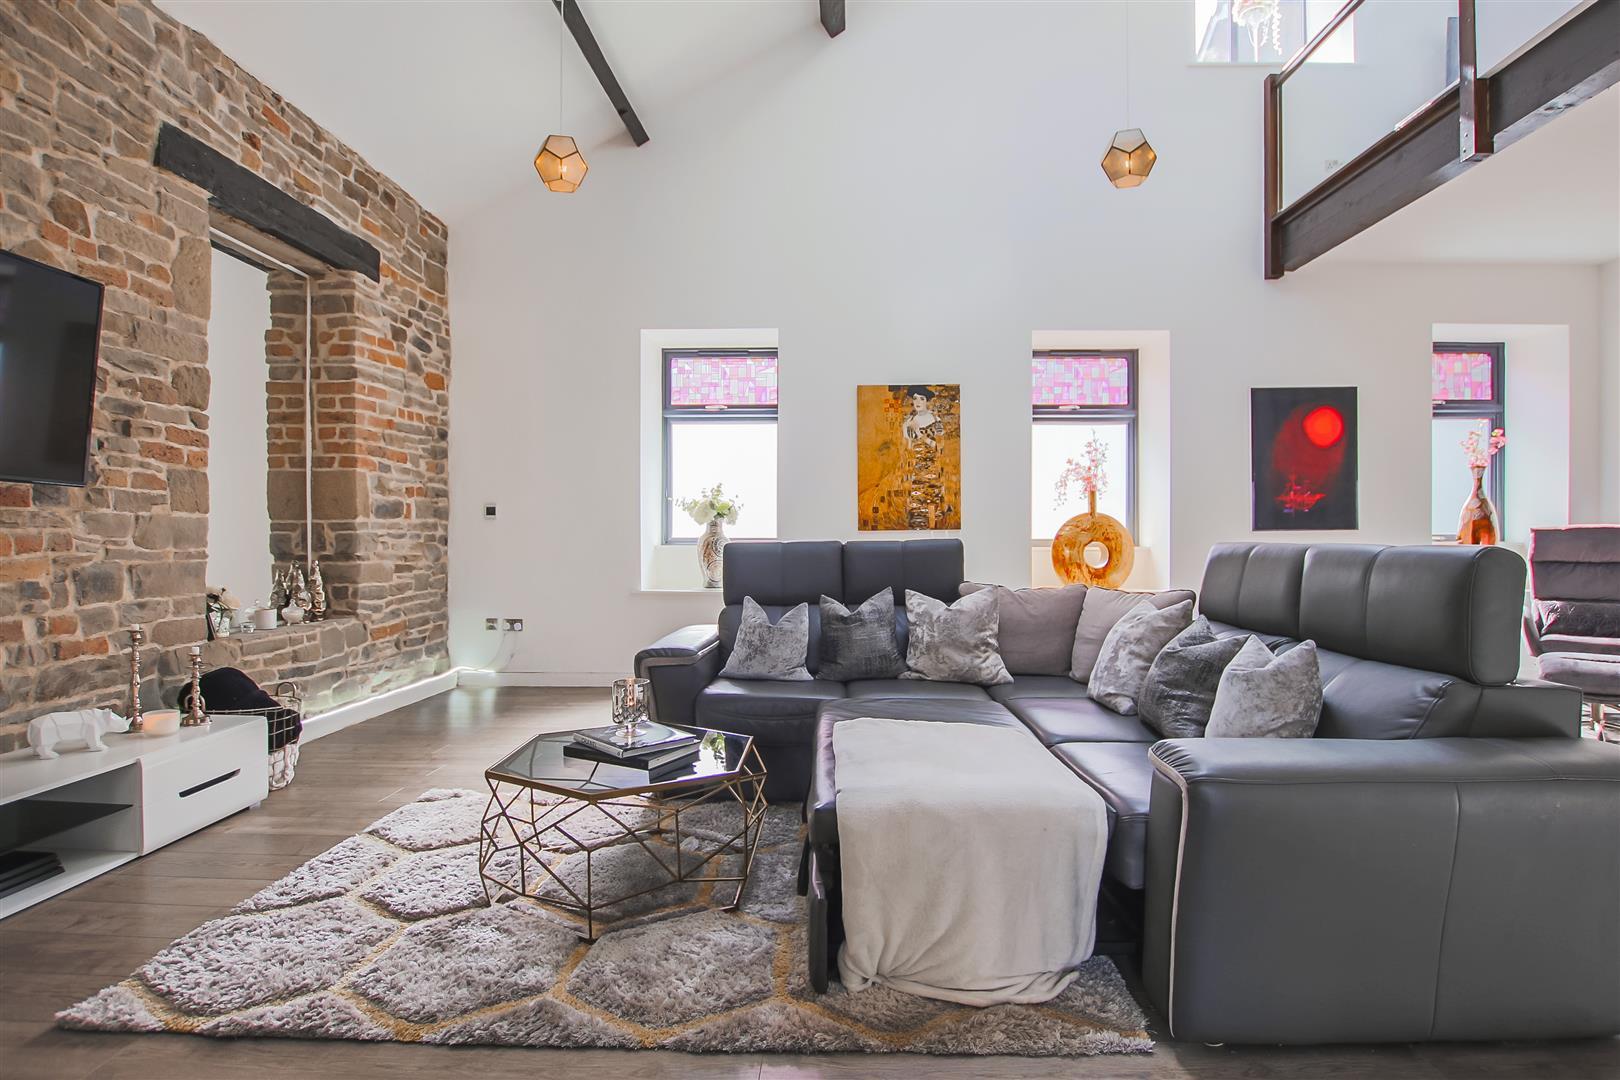 3 Bedroom Duplex Apartment For Sale - Image 15